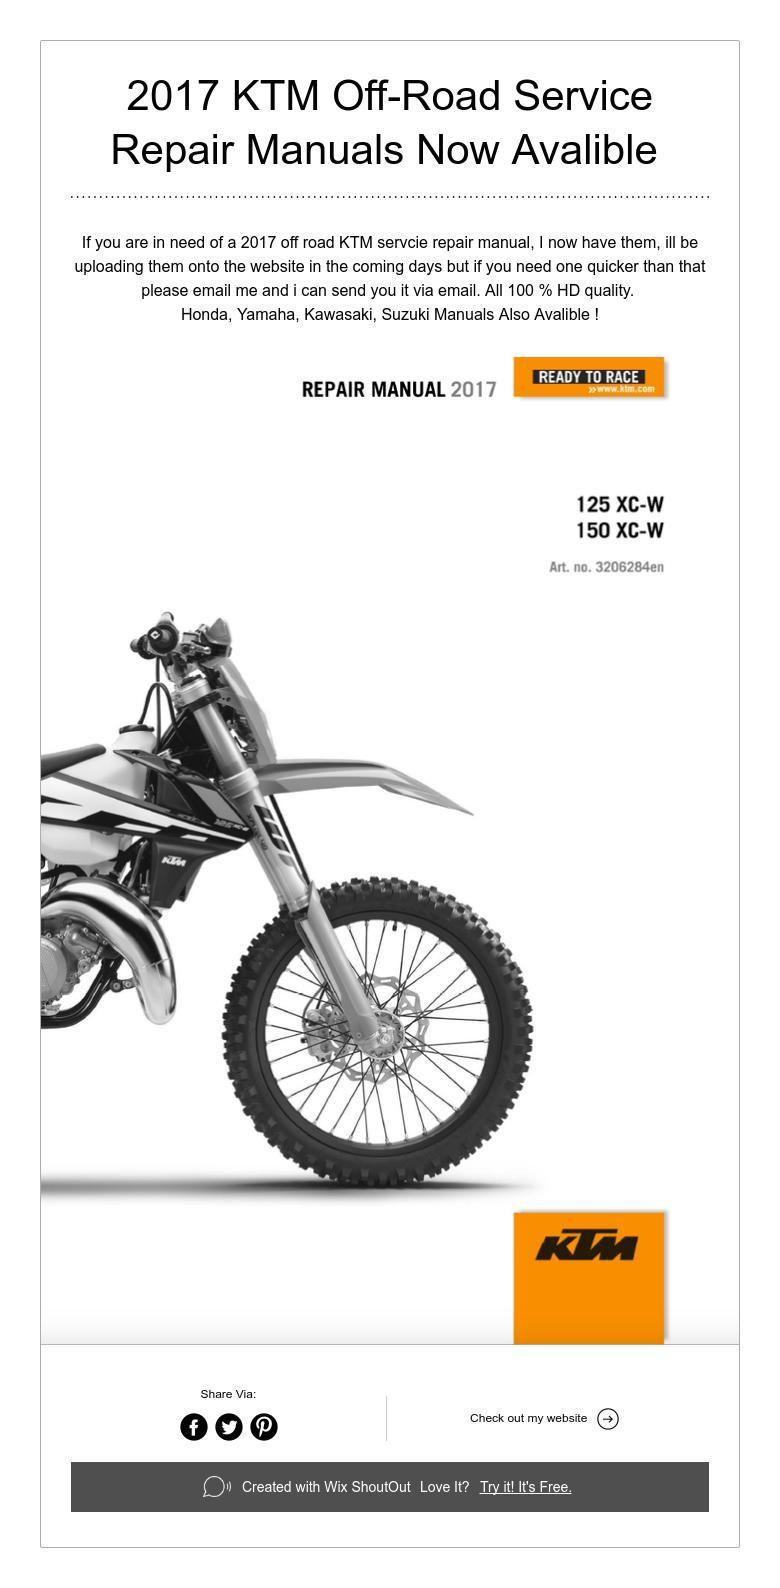 2017 KTM Repair Manuals Now Avalible